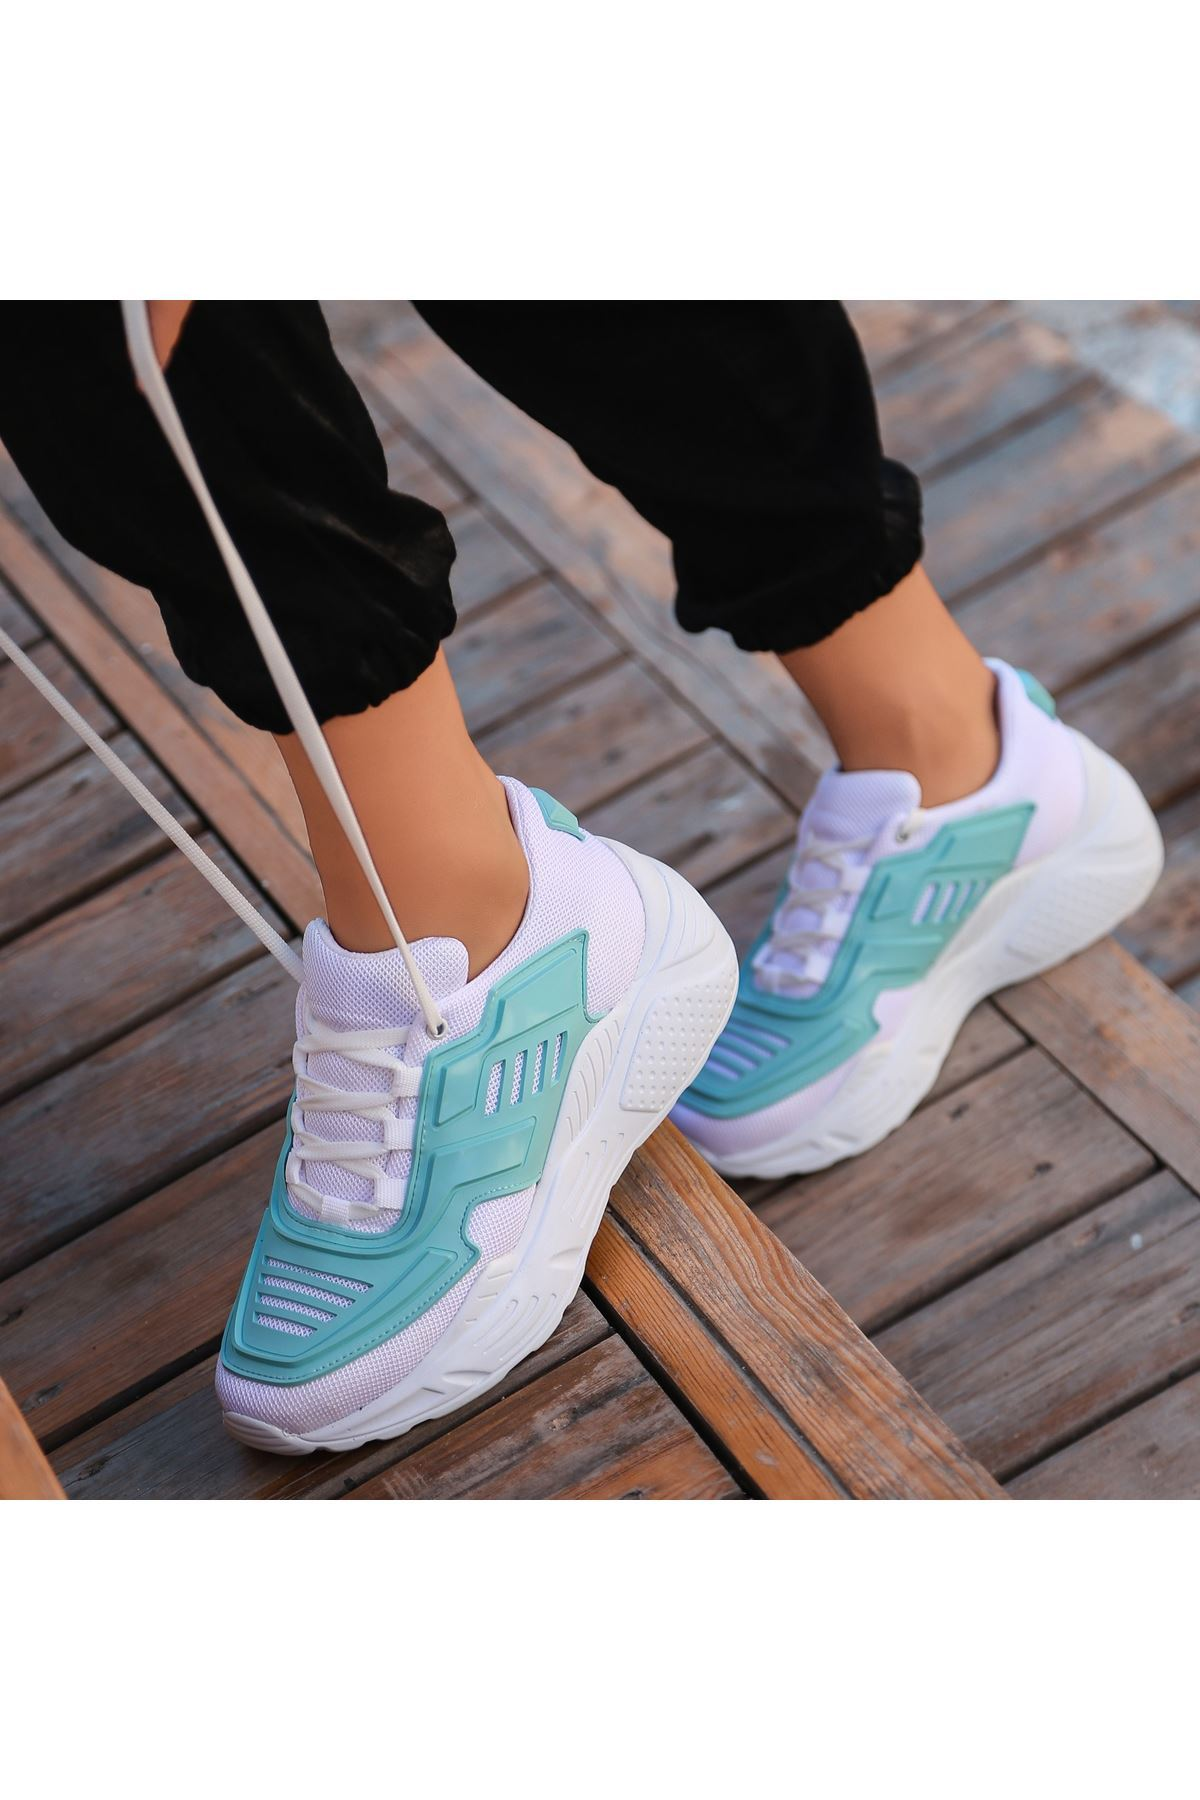 Maiy Mit Yeşili Cilt Fileli Spor Ayakkabı